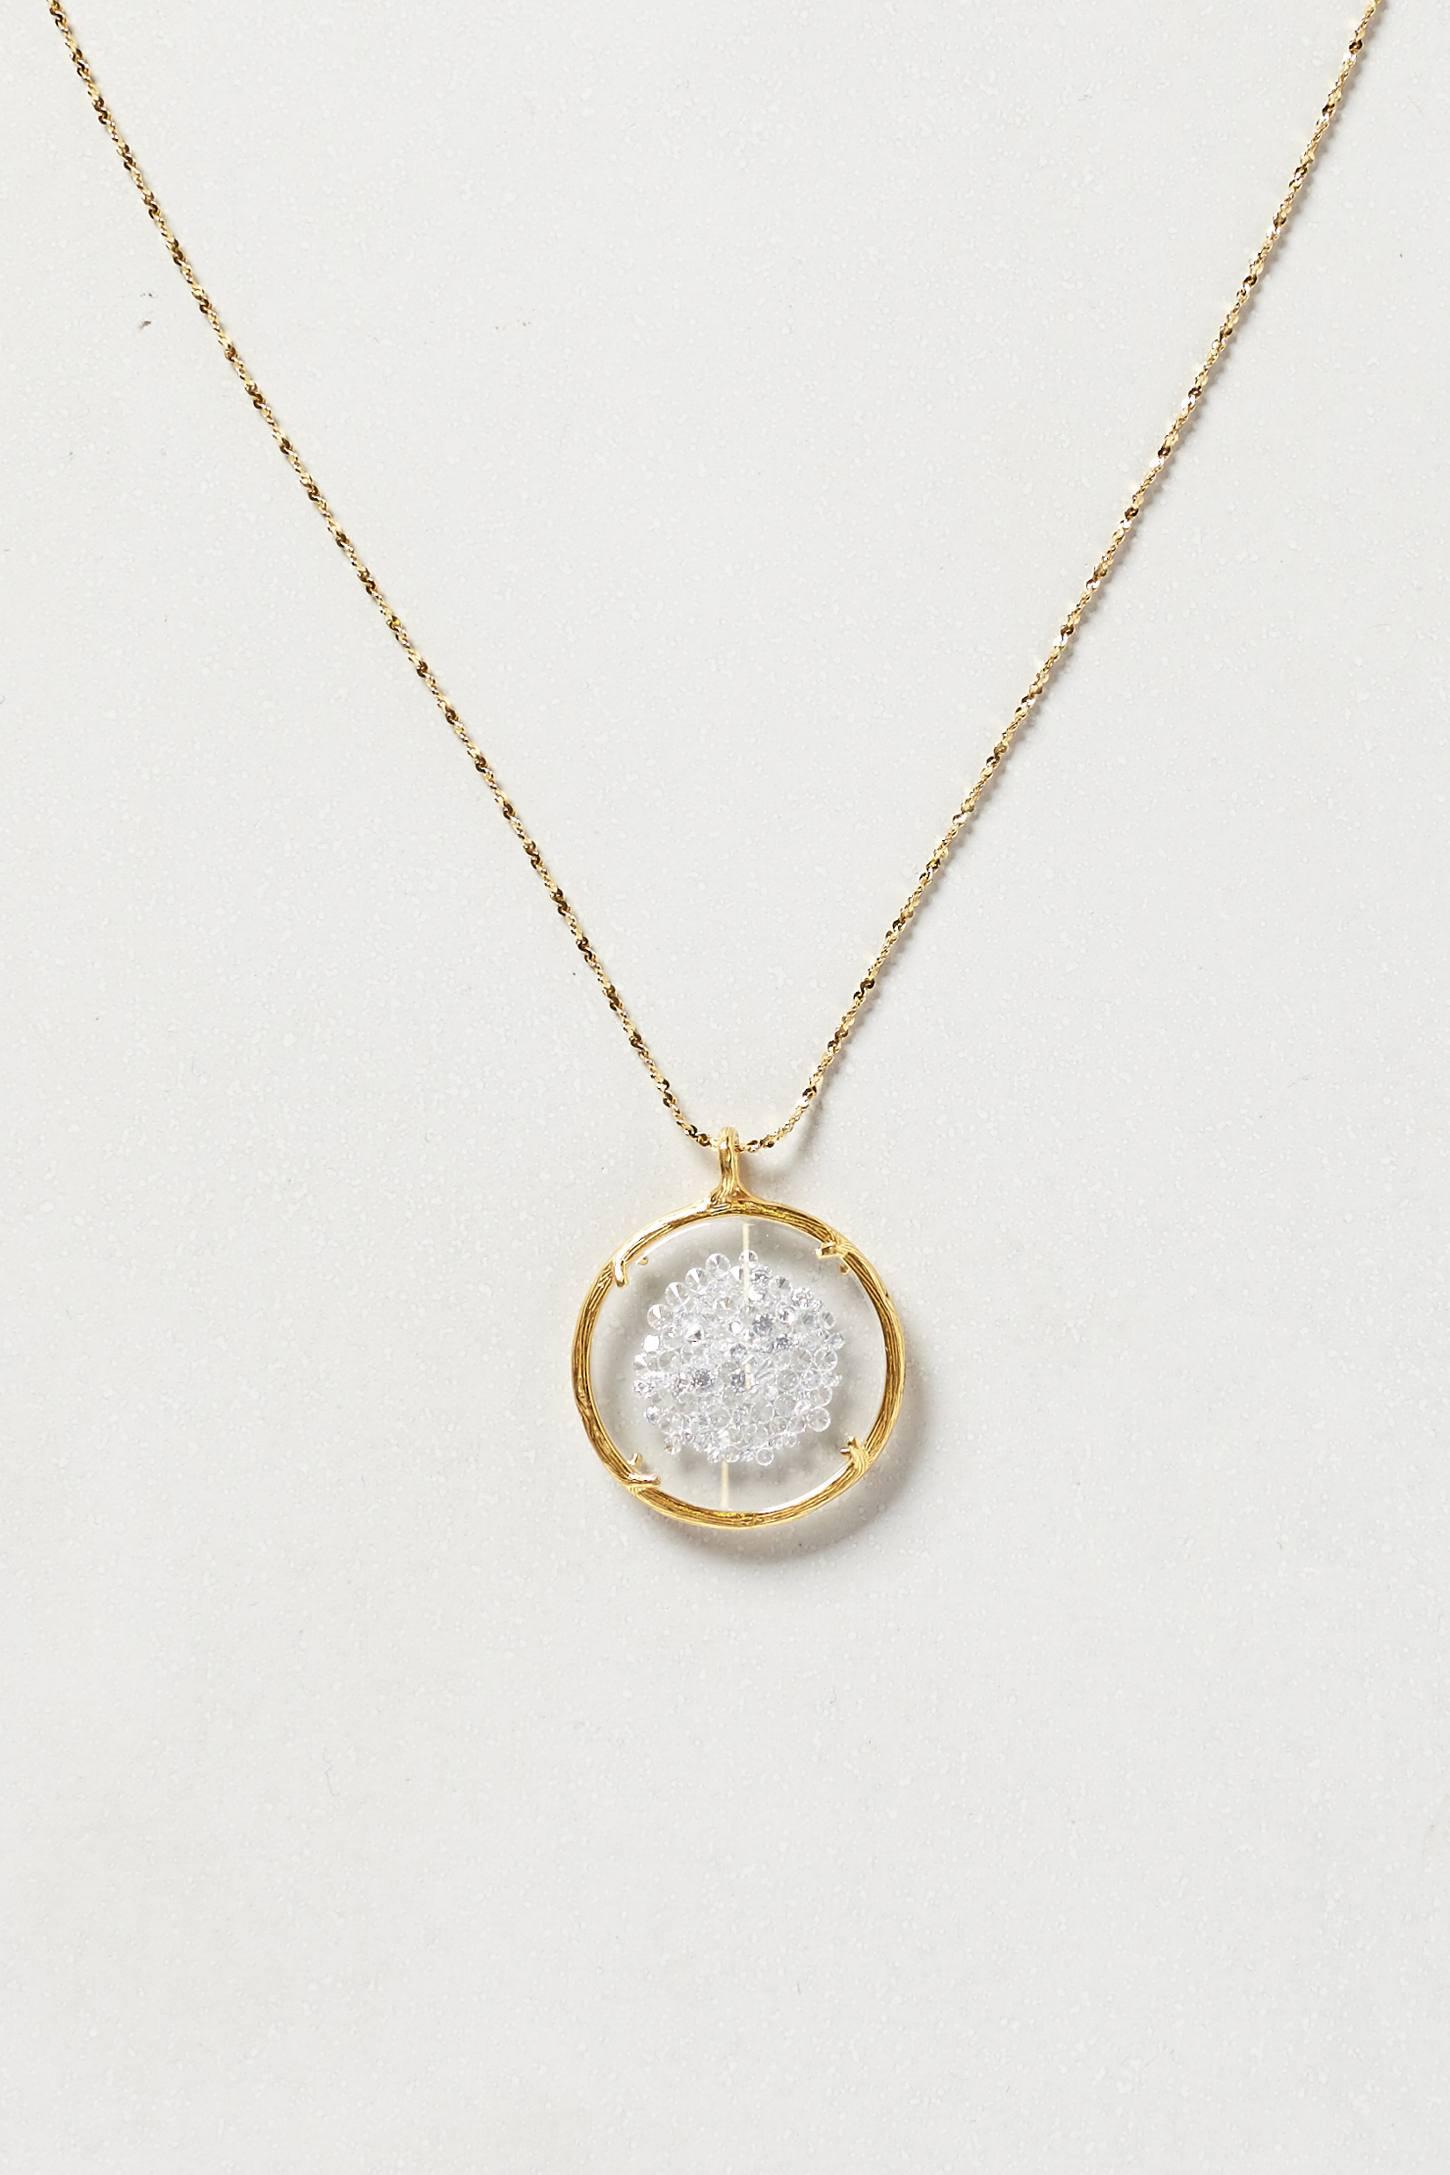 Catherine weitzman Spark Shaker Pendant Necklace in ...